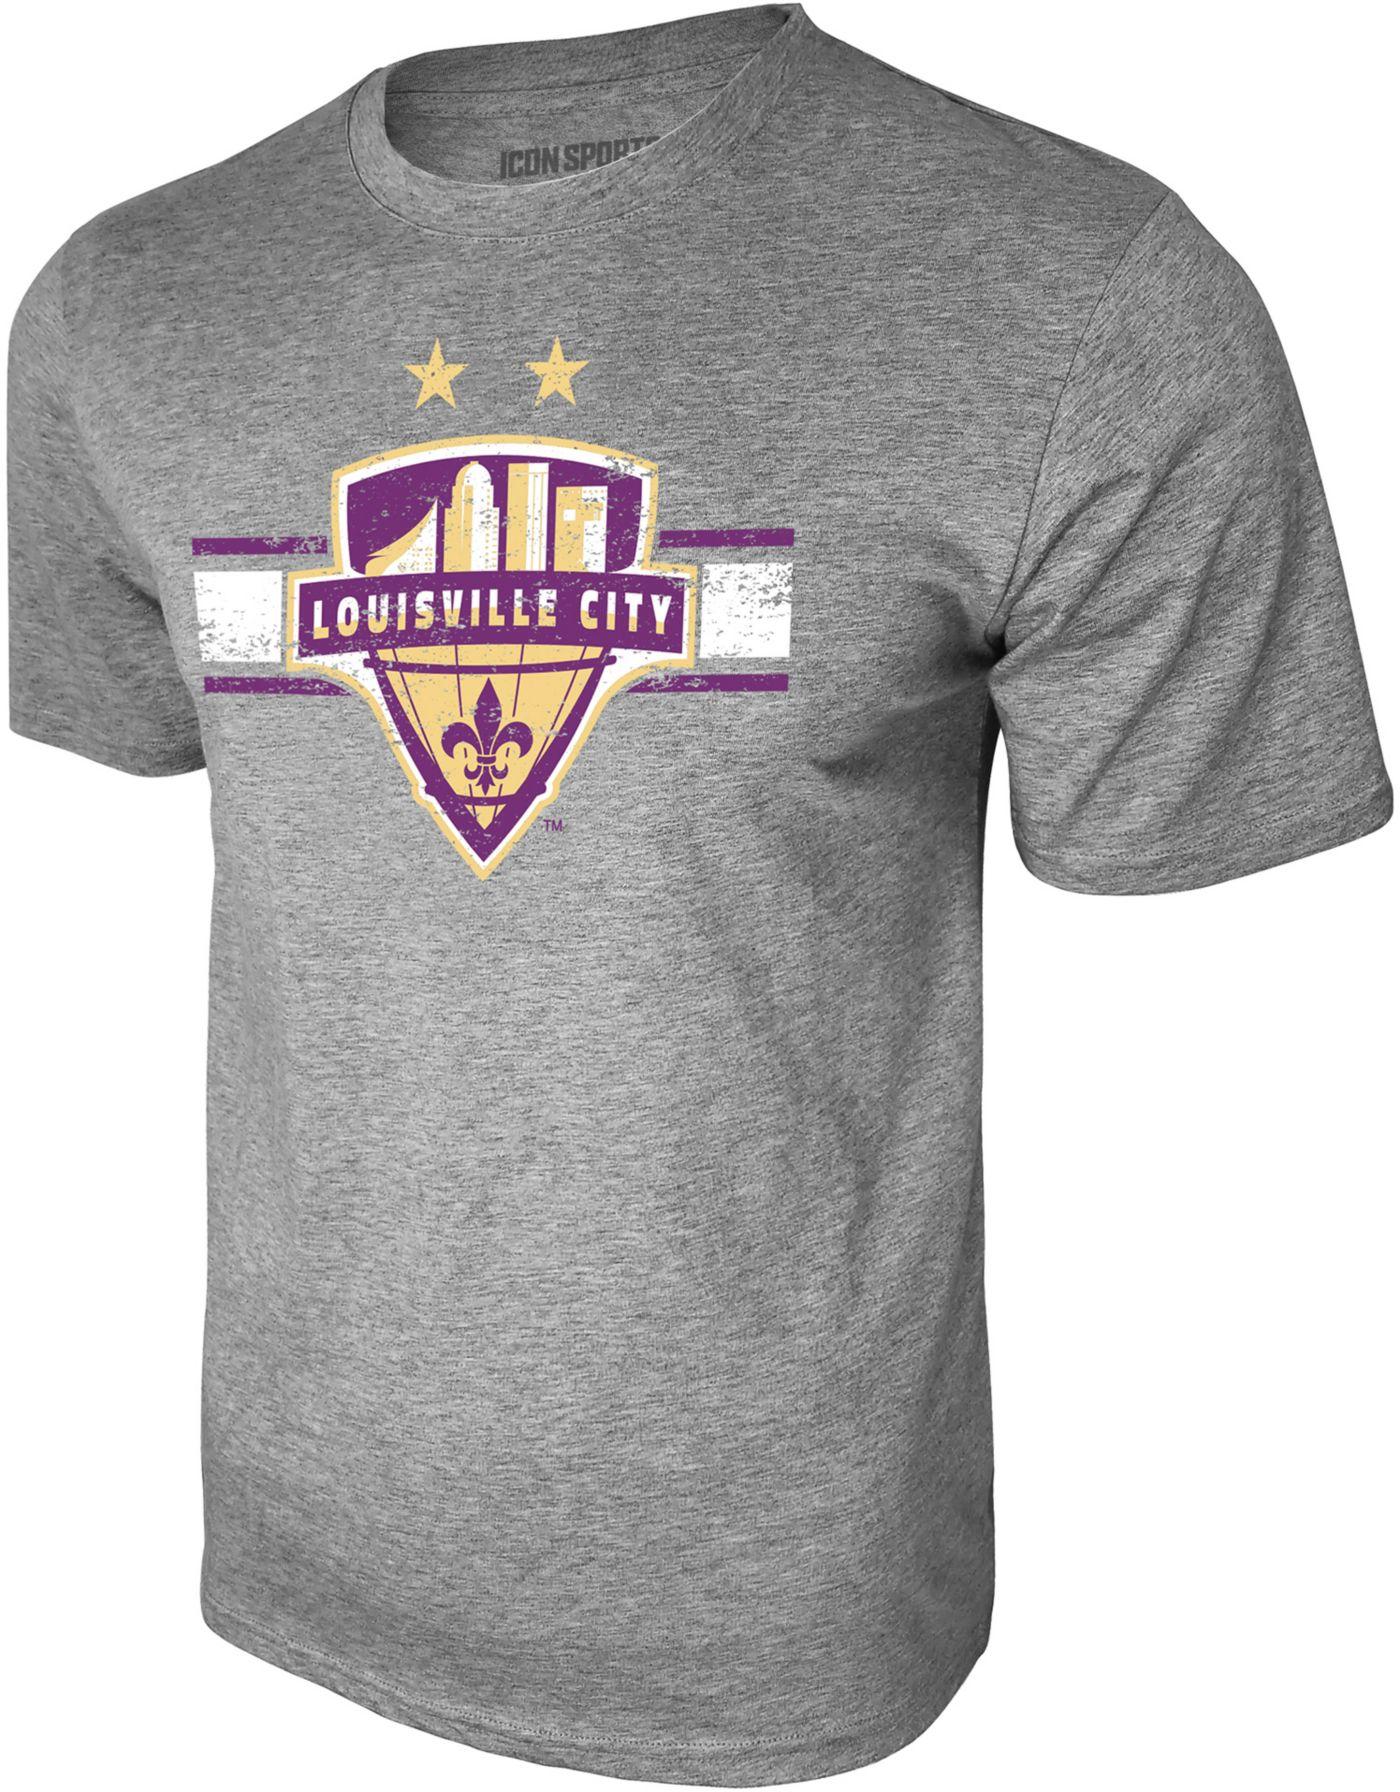 Icon Sports Group Men's Louisville City FC Logo Heather Grey T-Shirt